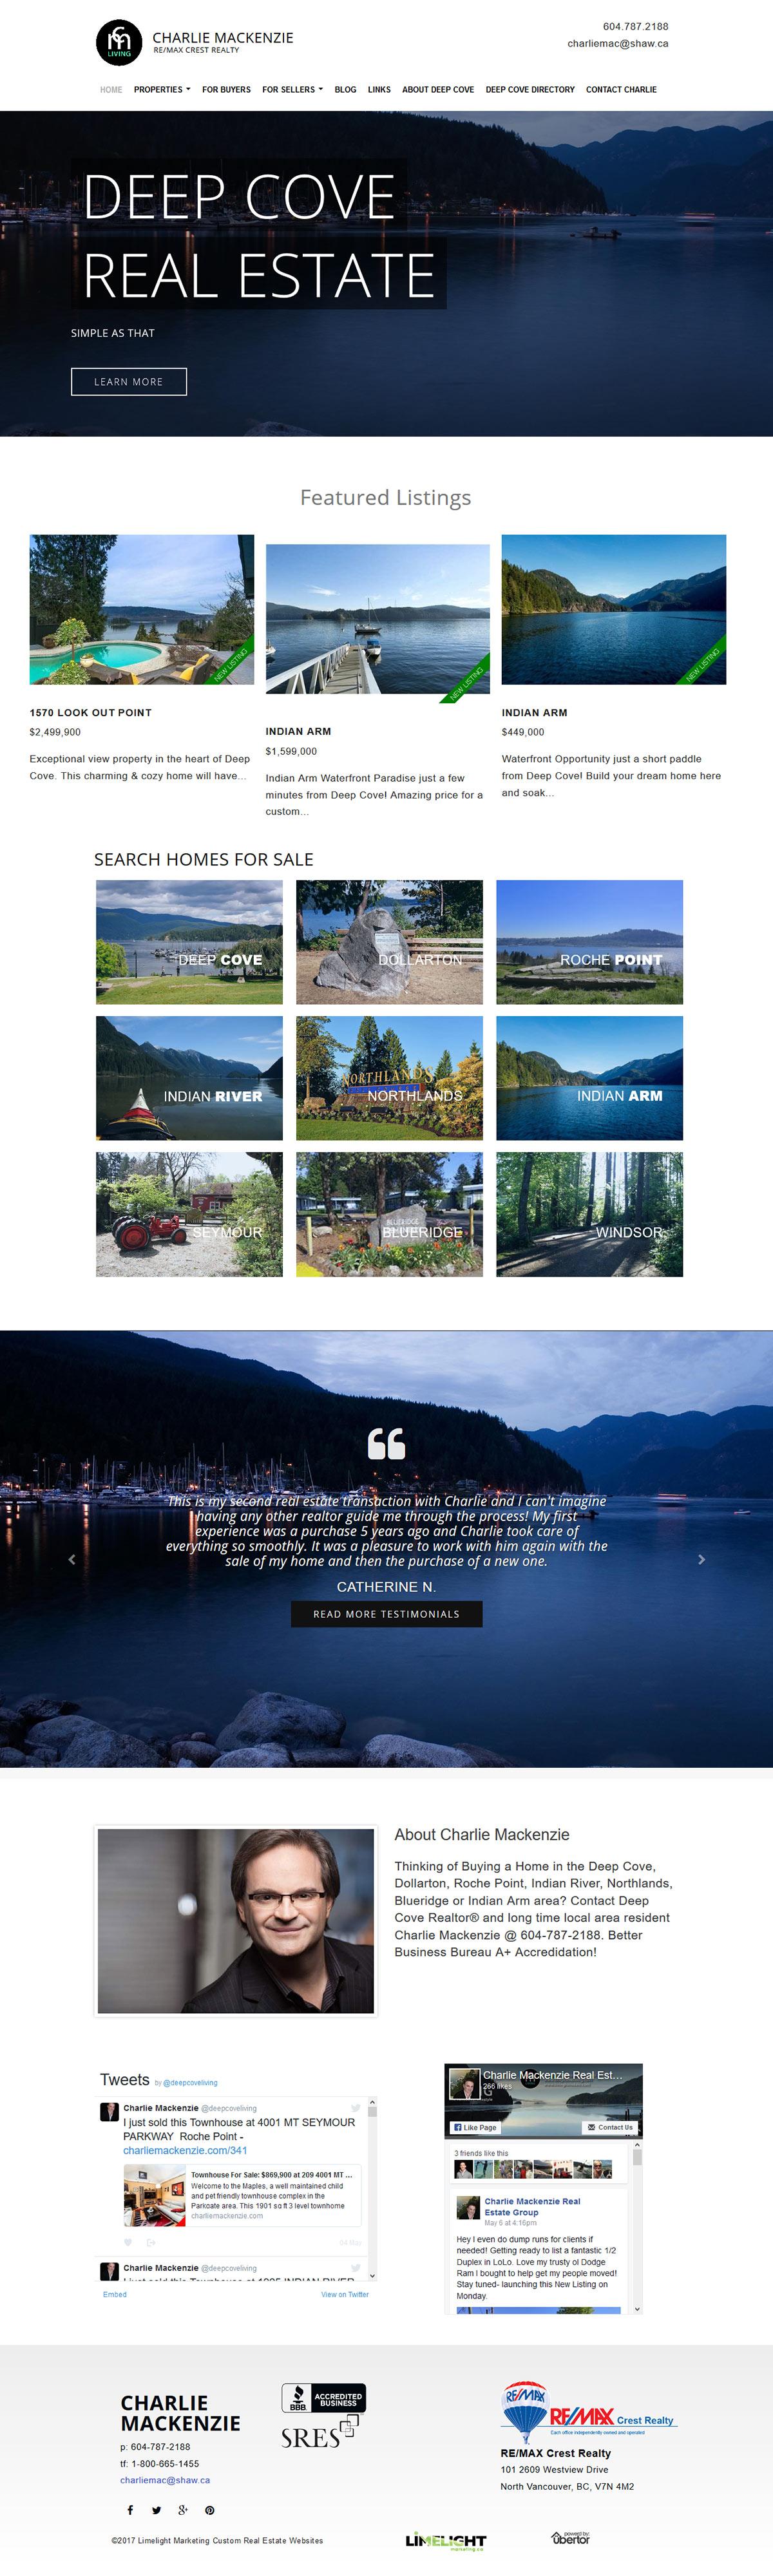 Website Makeover For Deep Cove Realtor Charlie Mackenzie Ubertor Cms Responsive And Mobile Ready Website Inspiration Website Design Custom Design